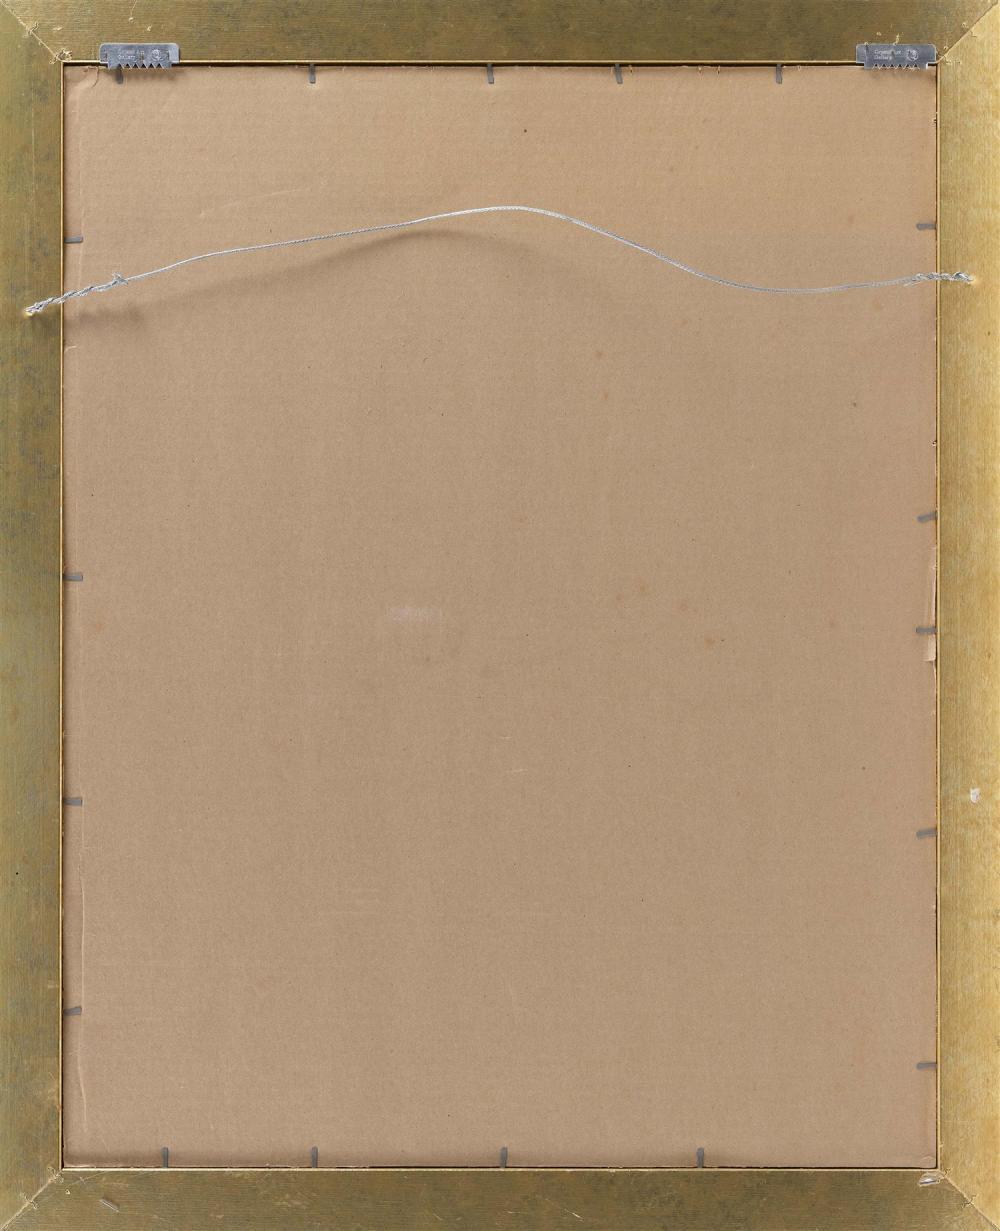 SANDRA BORDEAUX, Cape Cod, Massachusetts, Contemporary, Koi pond., Watercolor on paper, 21